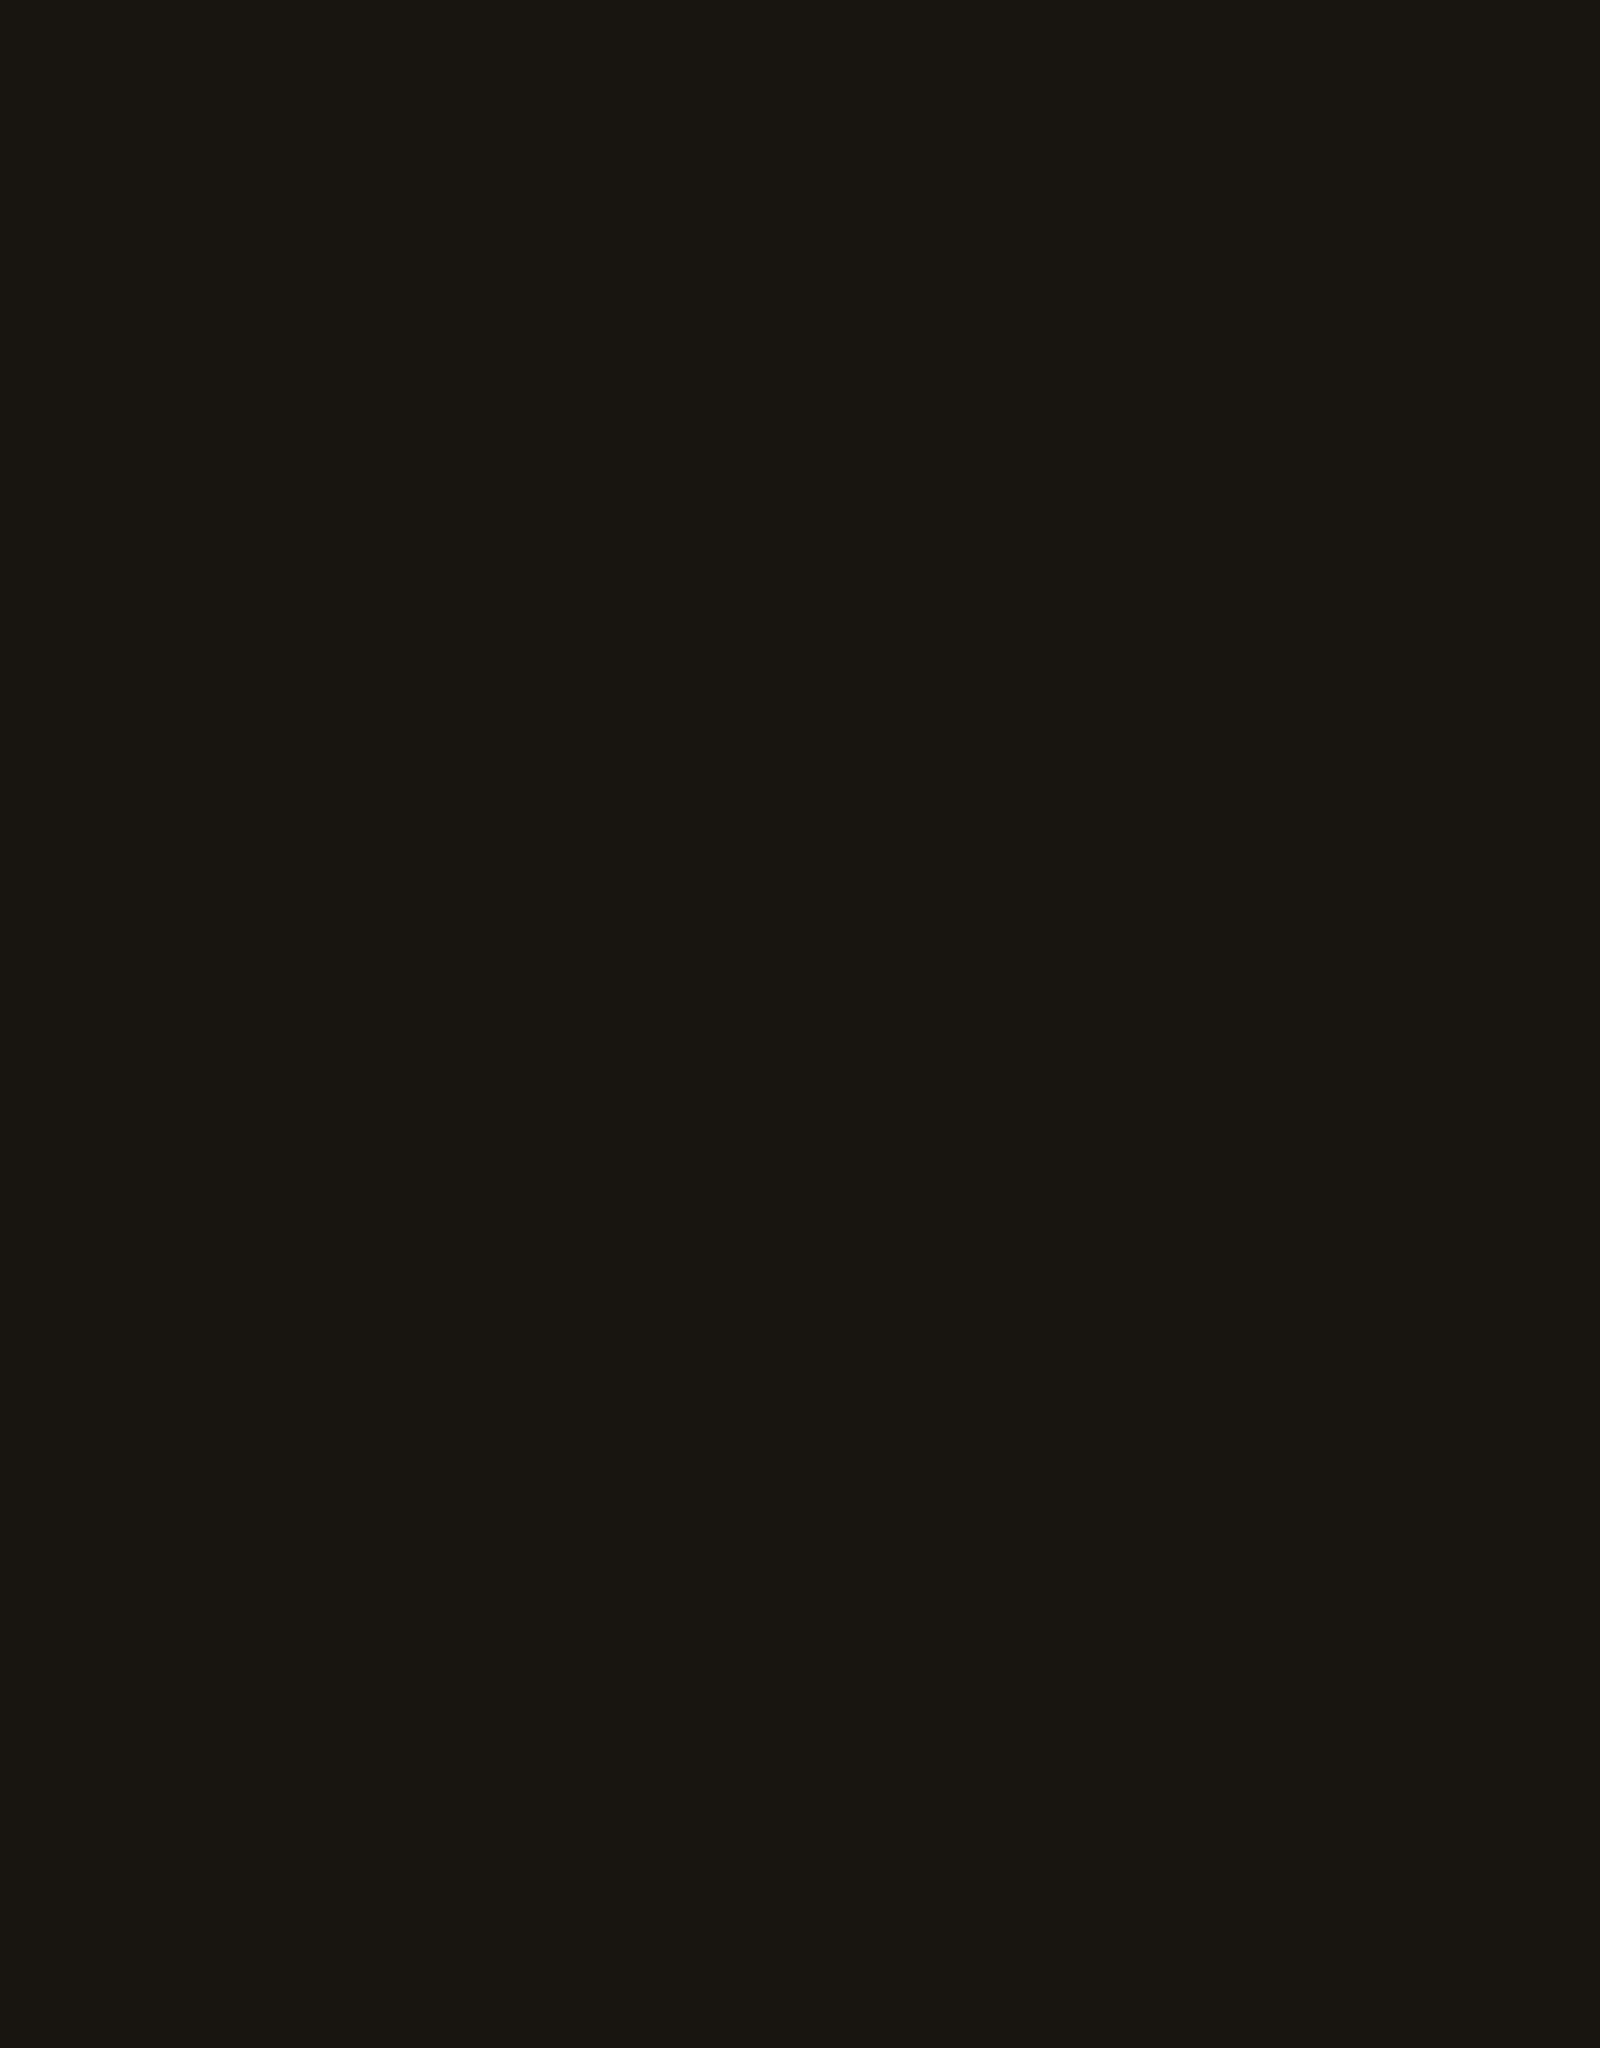 Trapsuutjies Black Large